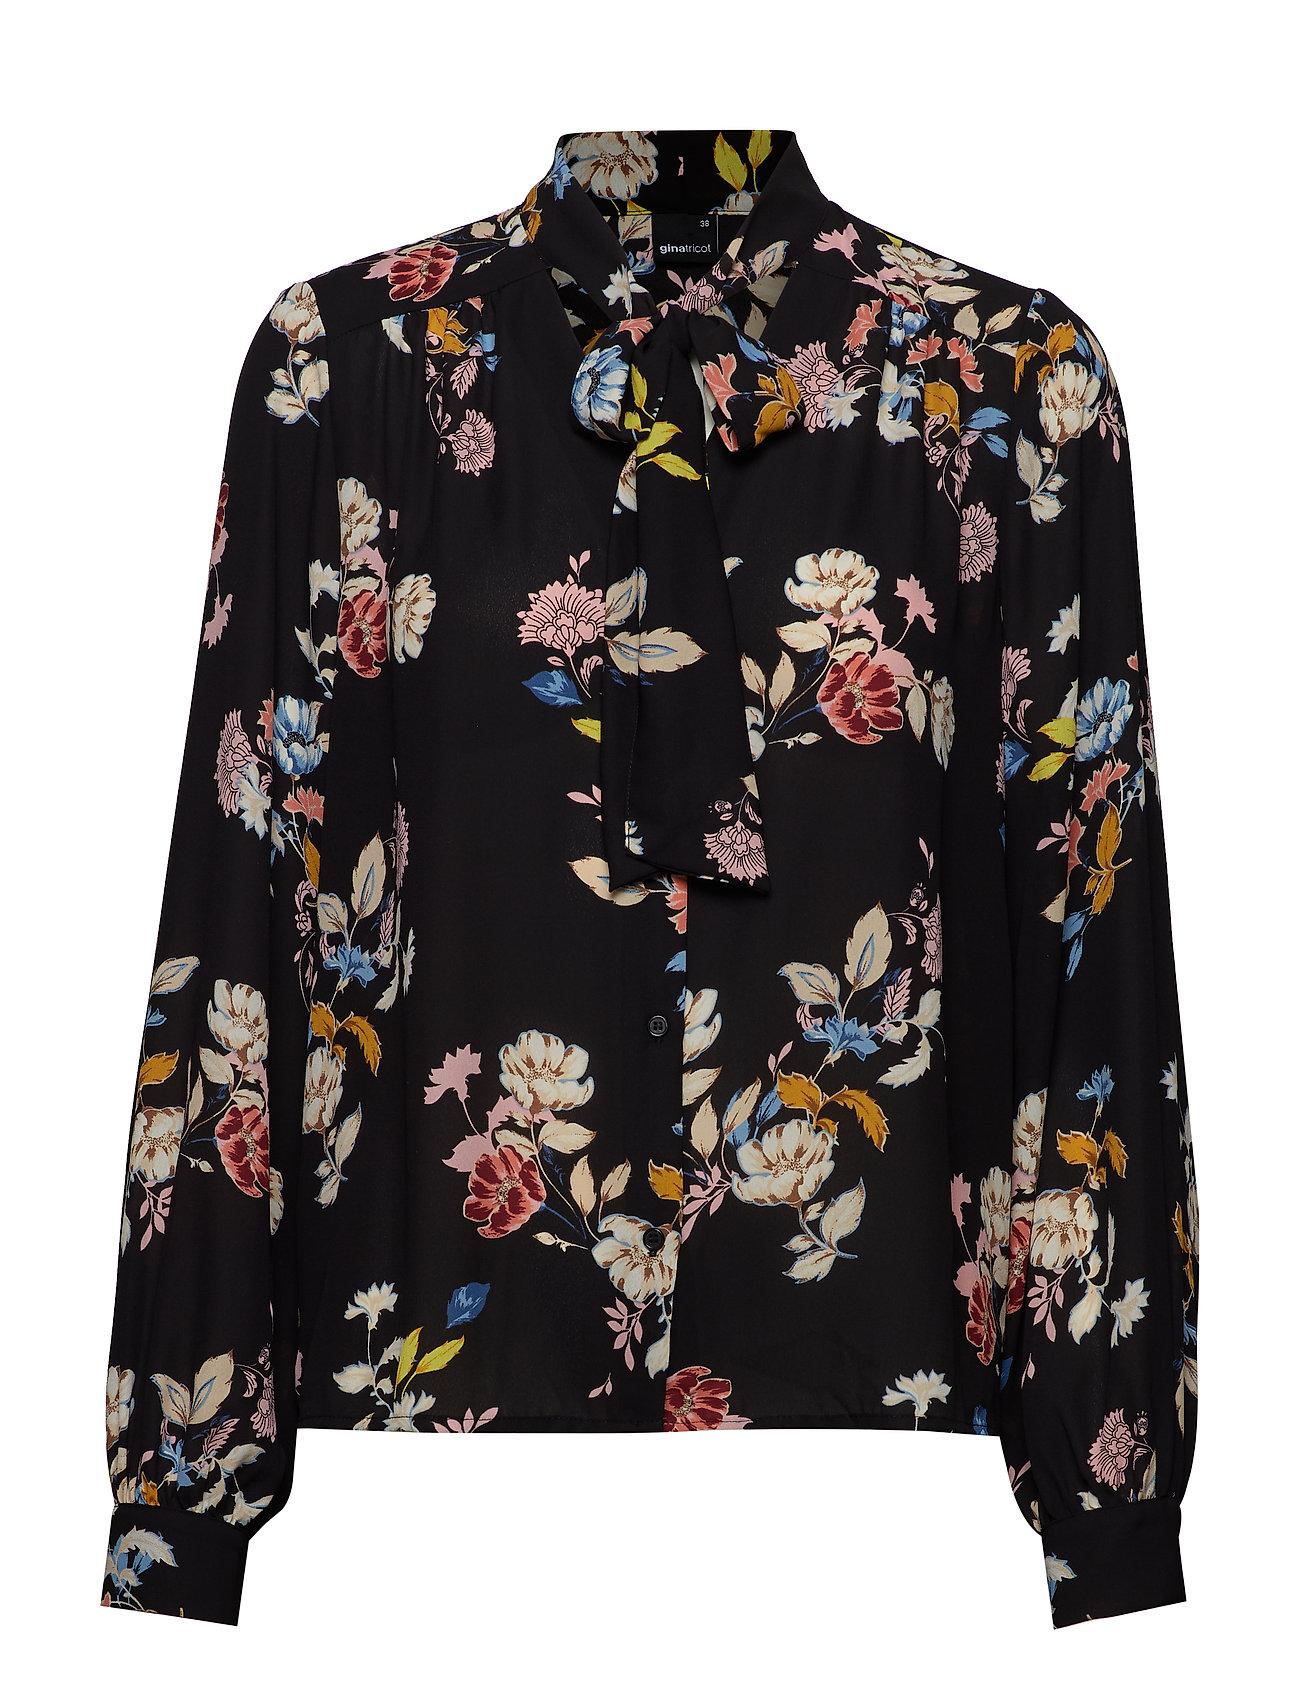 Gina Tricot Dolores tie neck blouse Ögrönlar